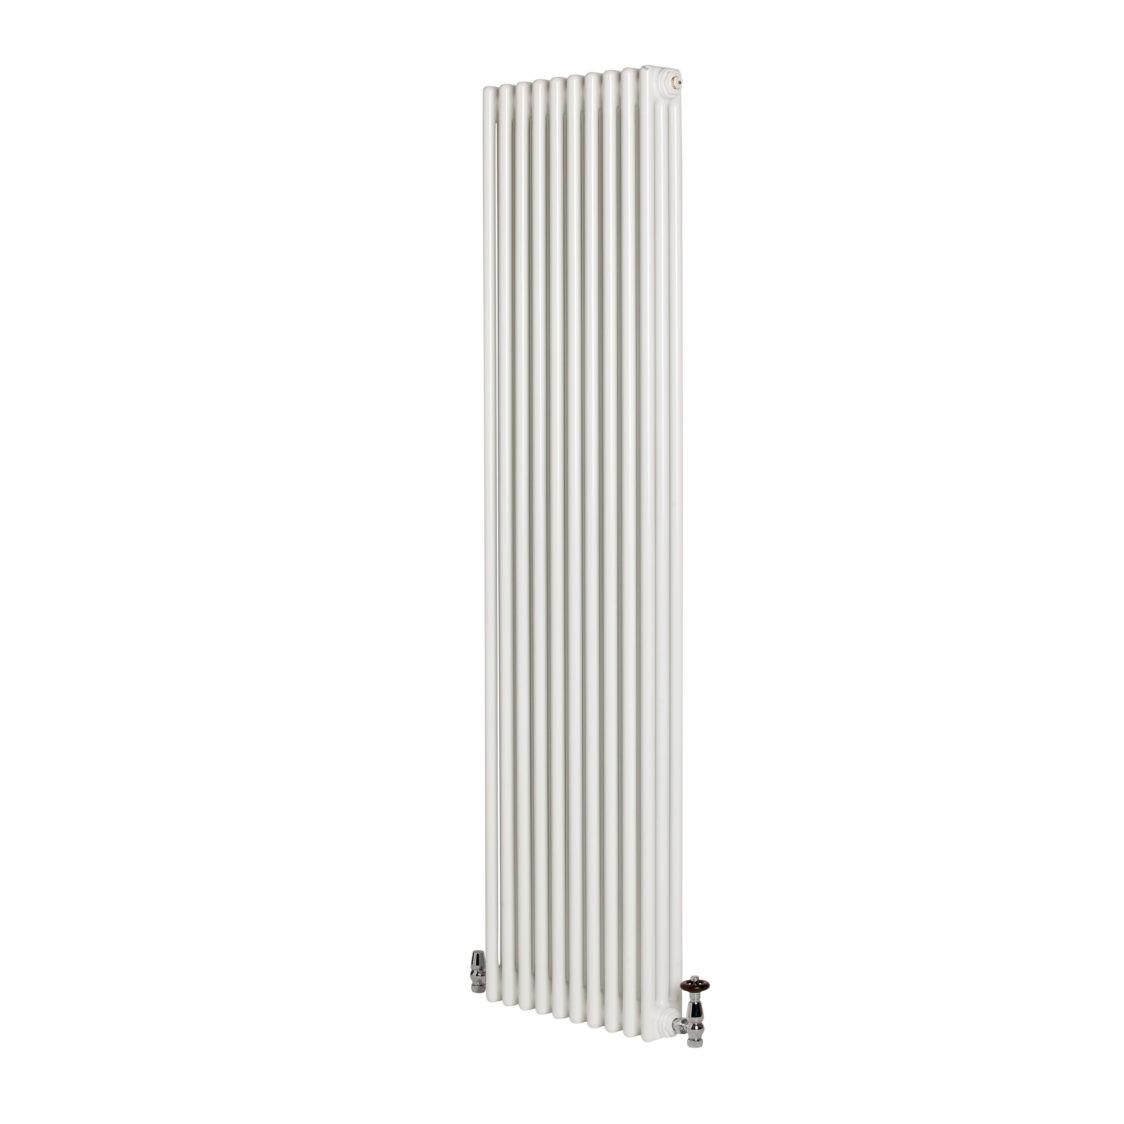 Revive 3 Column Vertical Radiator White H 2000mm W 490mm